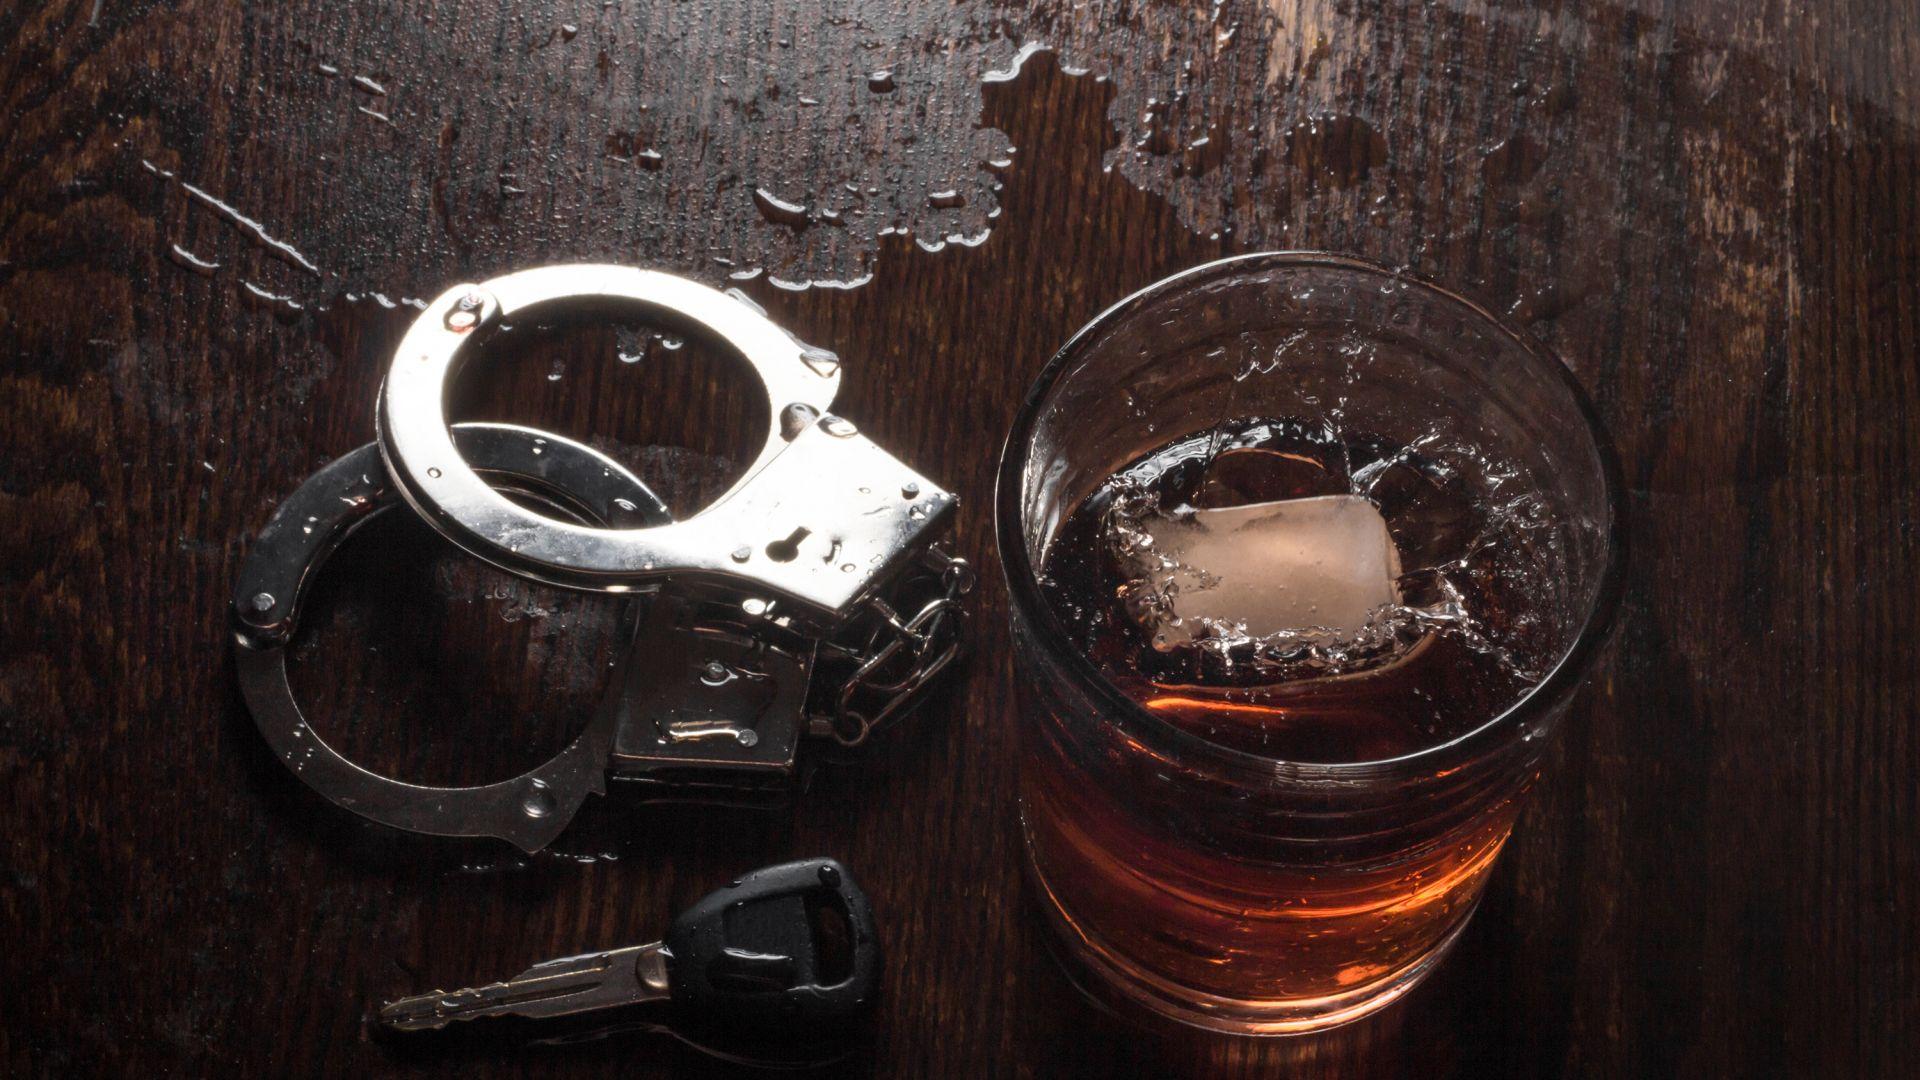 30-годишна пияна шофьорка оцеля по чудо край Благоевград